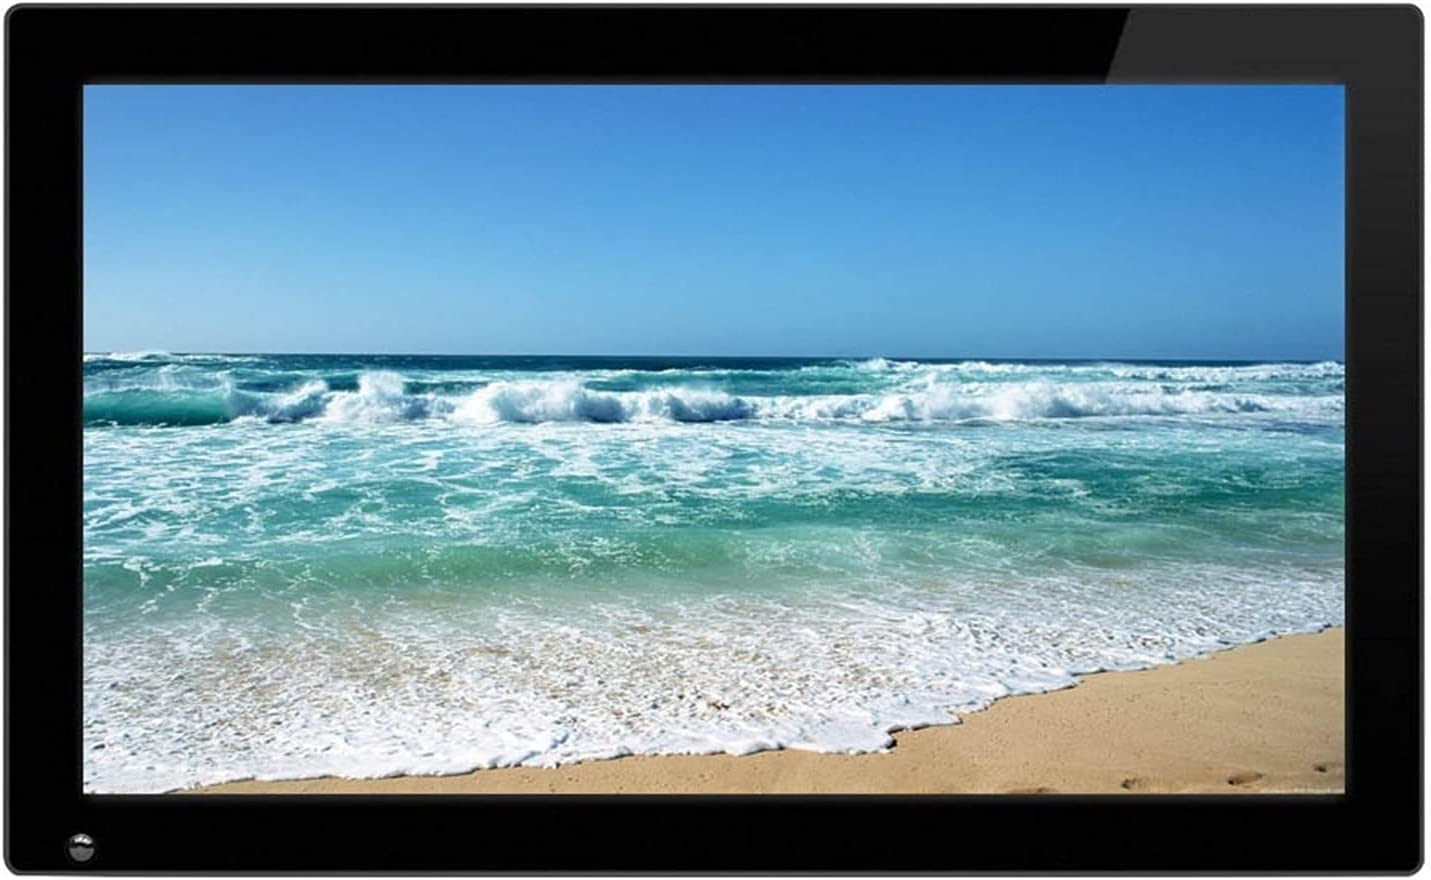 Cheap bargain 24-inch Digital Max 43% OFF Photo Frame high-Definition IPS Screen P